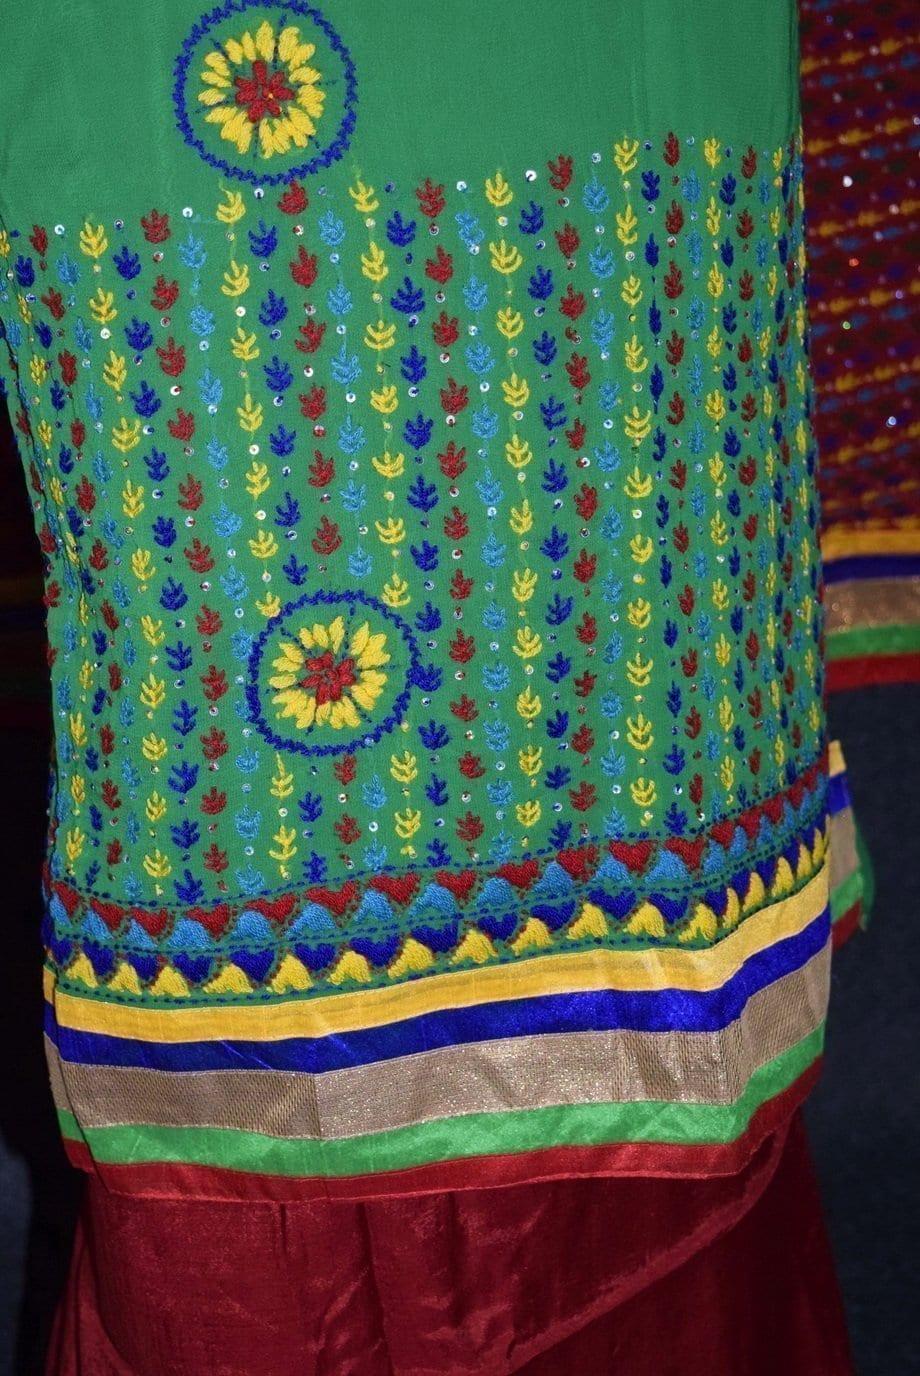 Party Wear Georgette hand Embroidered Salwar kameez stole suit set F0648 3